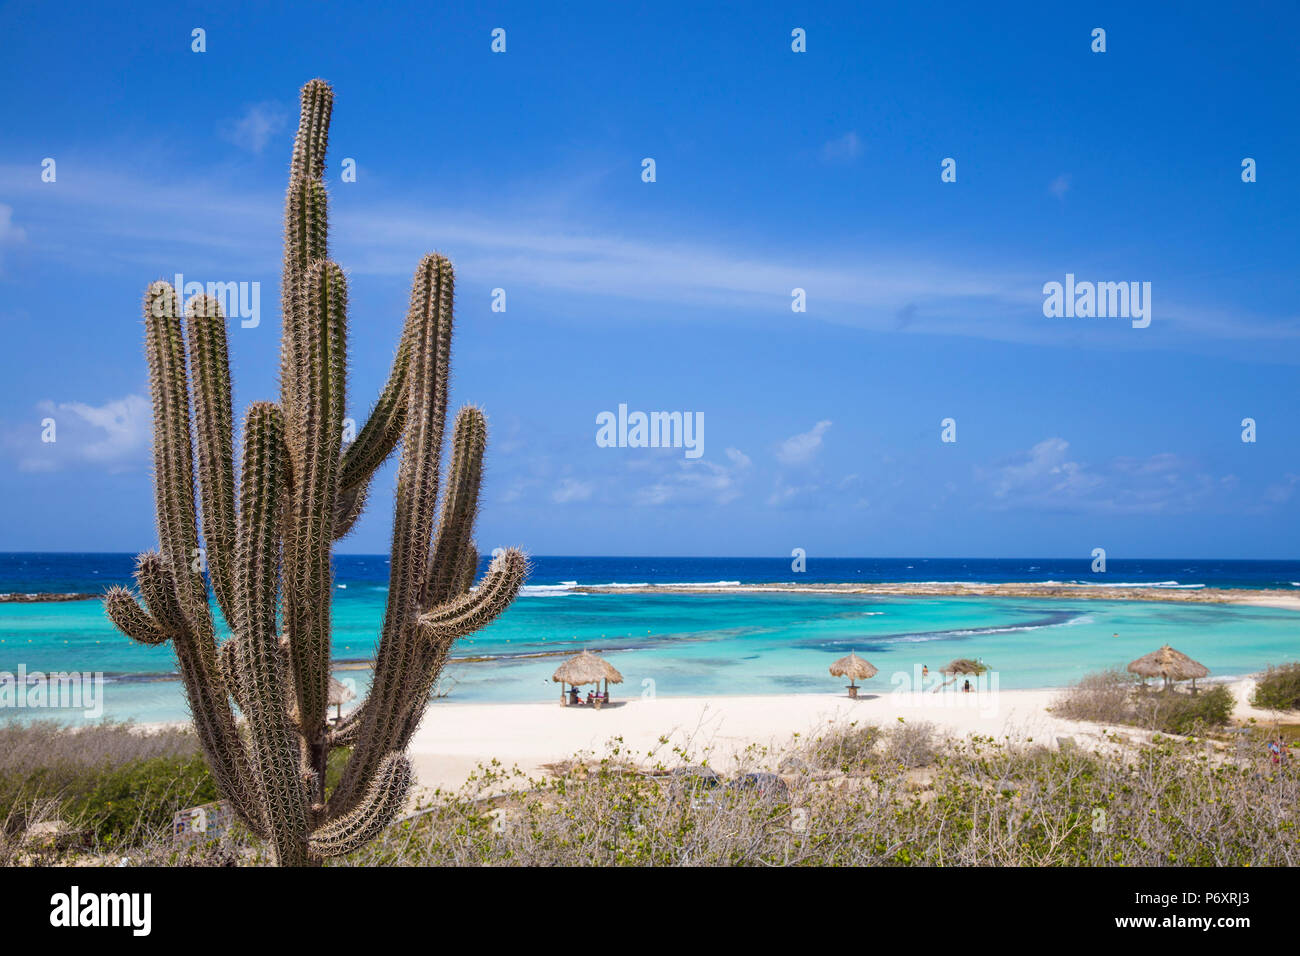 Caribbean, Netherland Antilles, Aruba, Baby beach - Stock Image